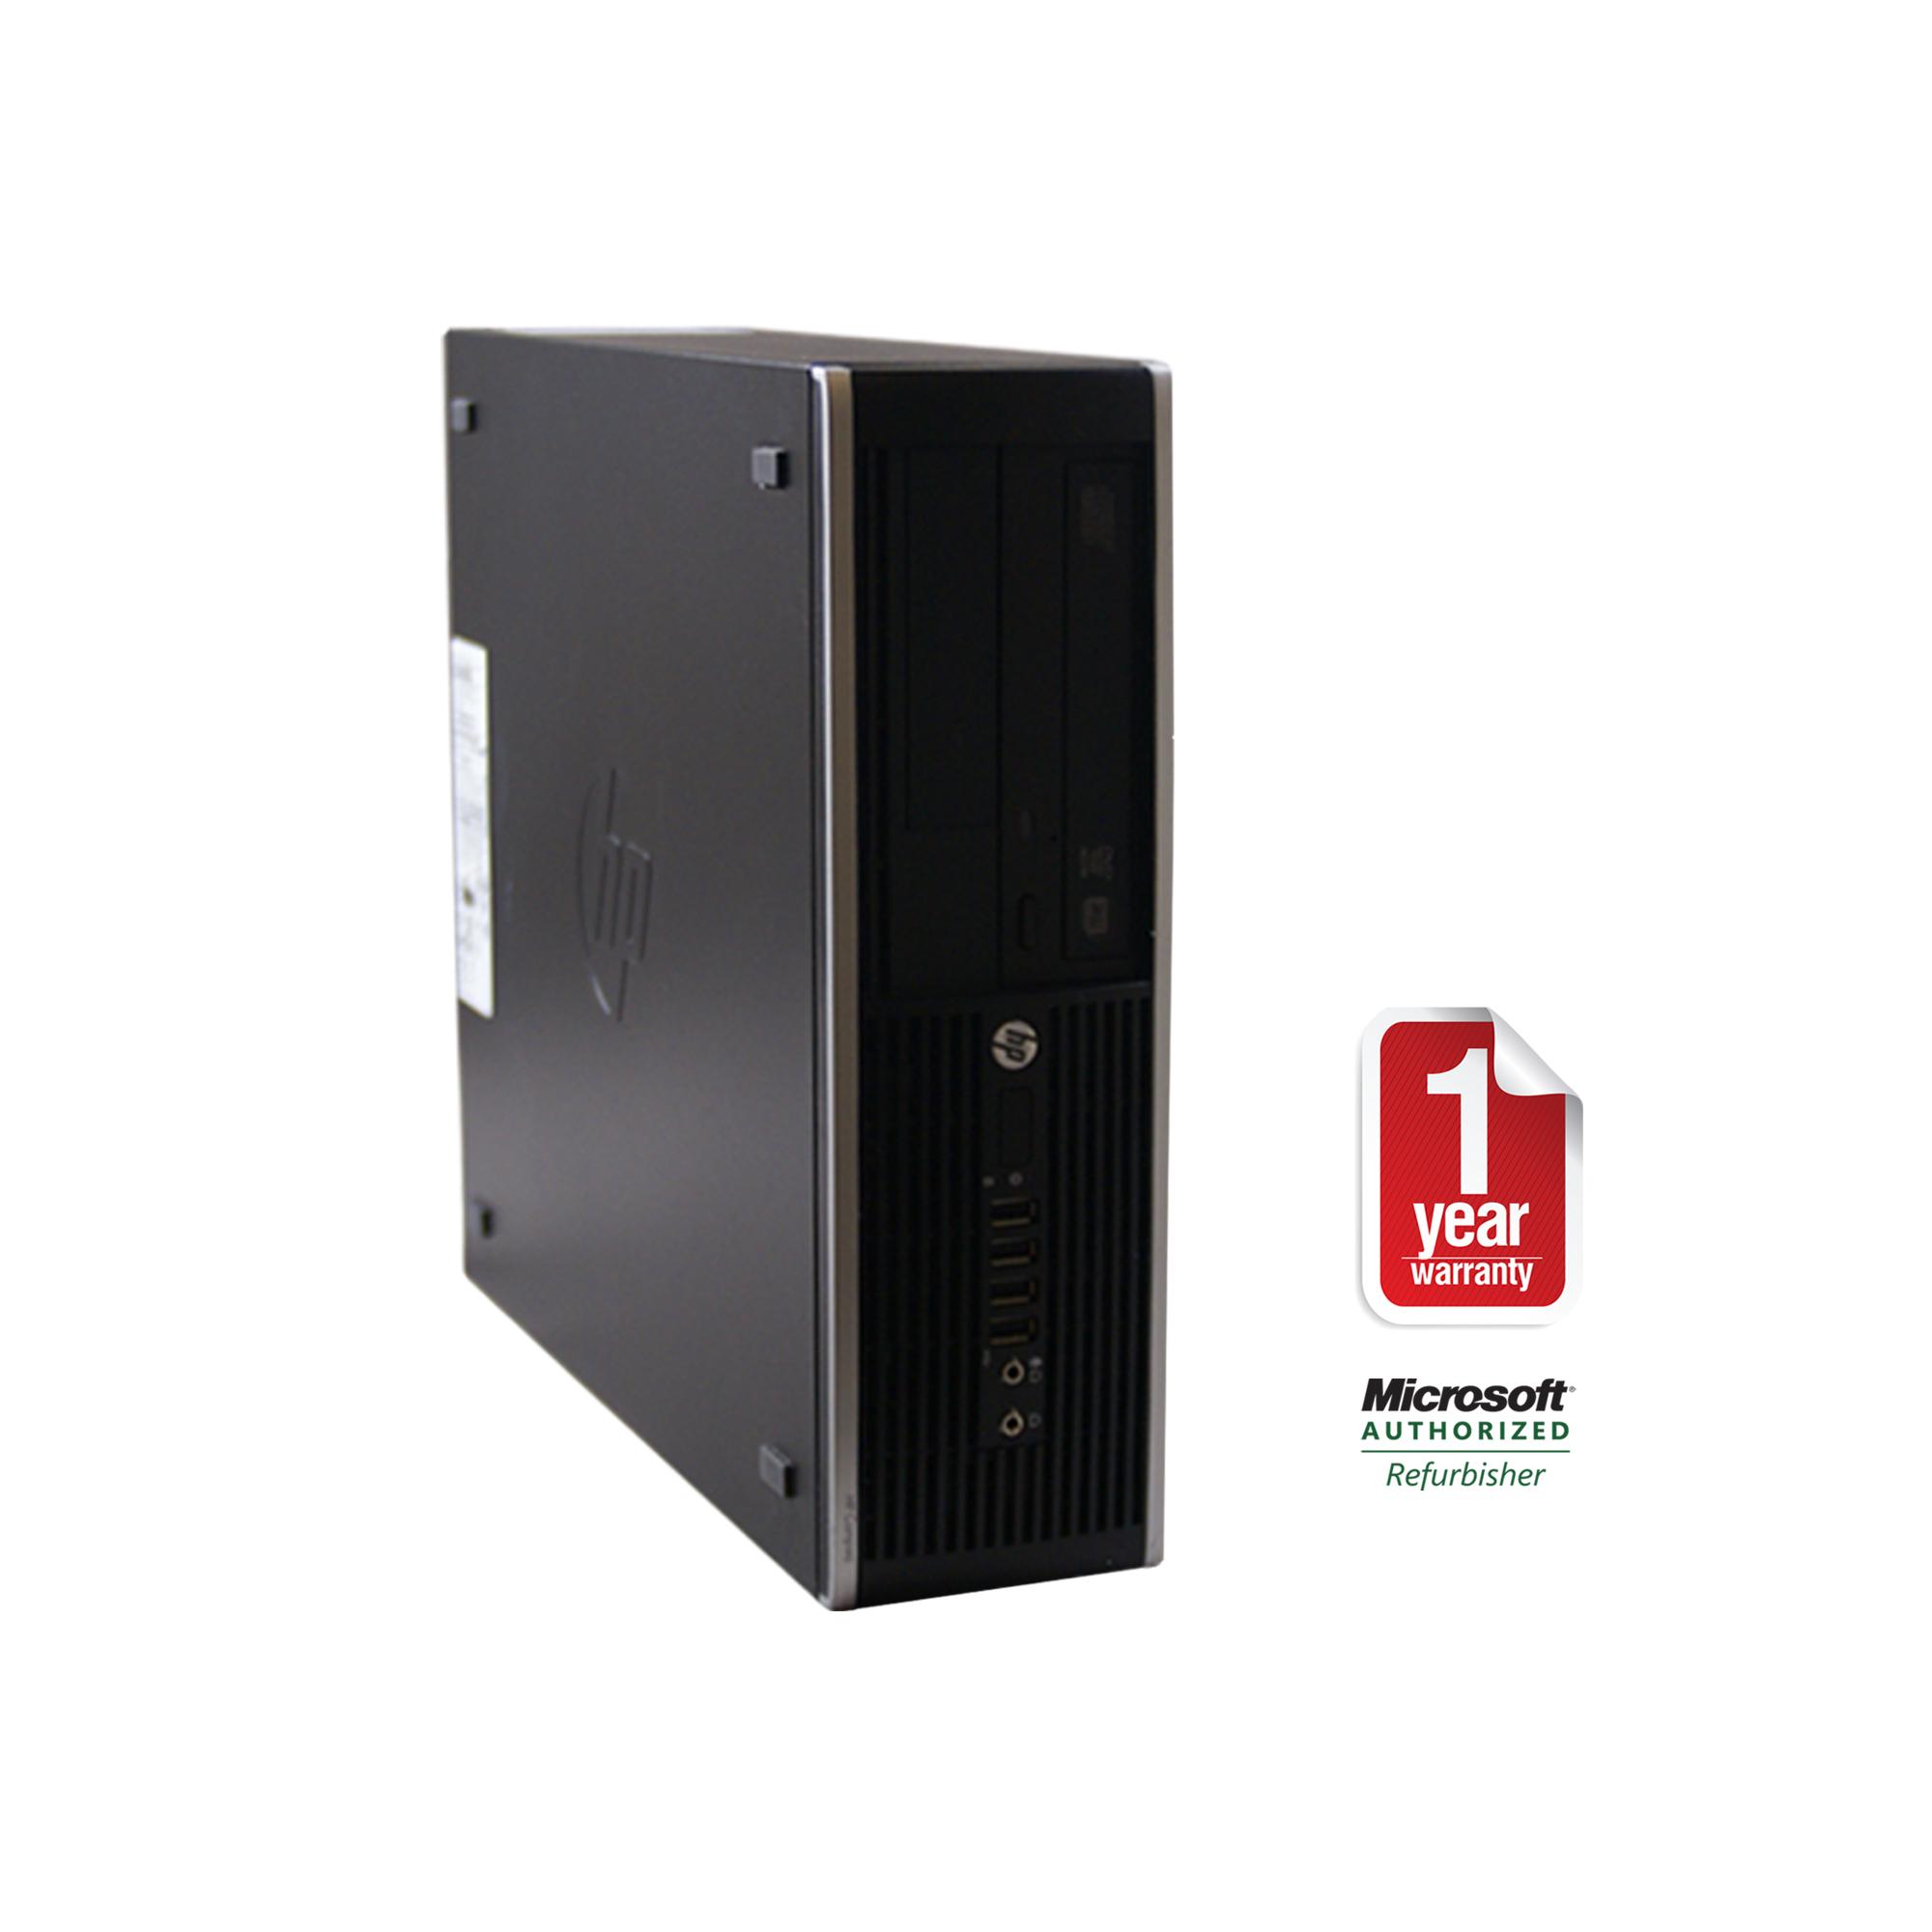 HP HP 8200 Refurbished Small Form Factor Core I5 3.1/4GB/160GB/DVD/W7P64